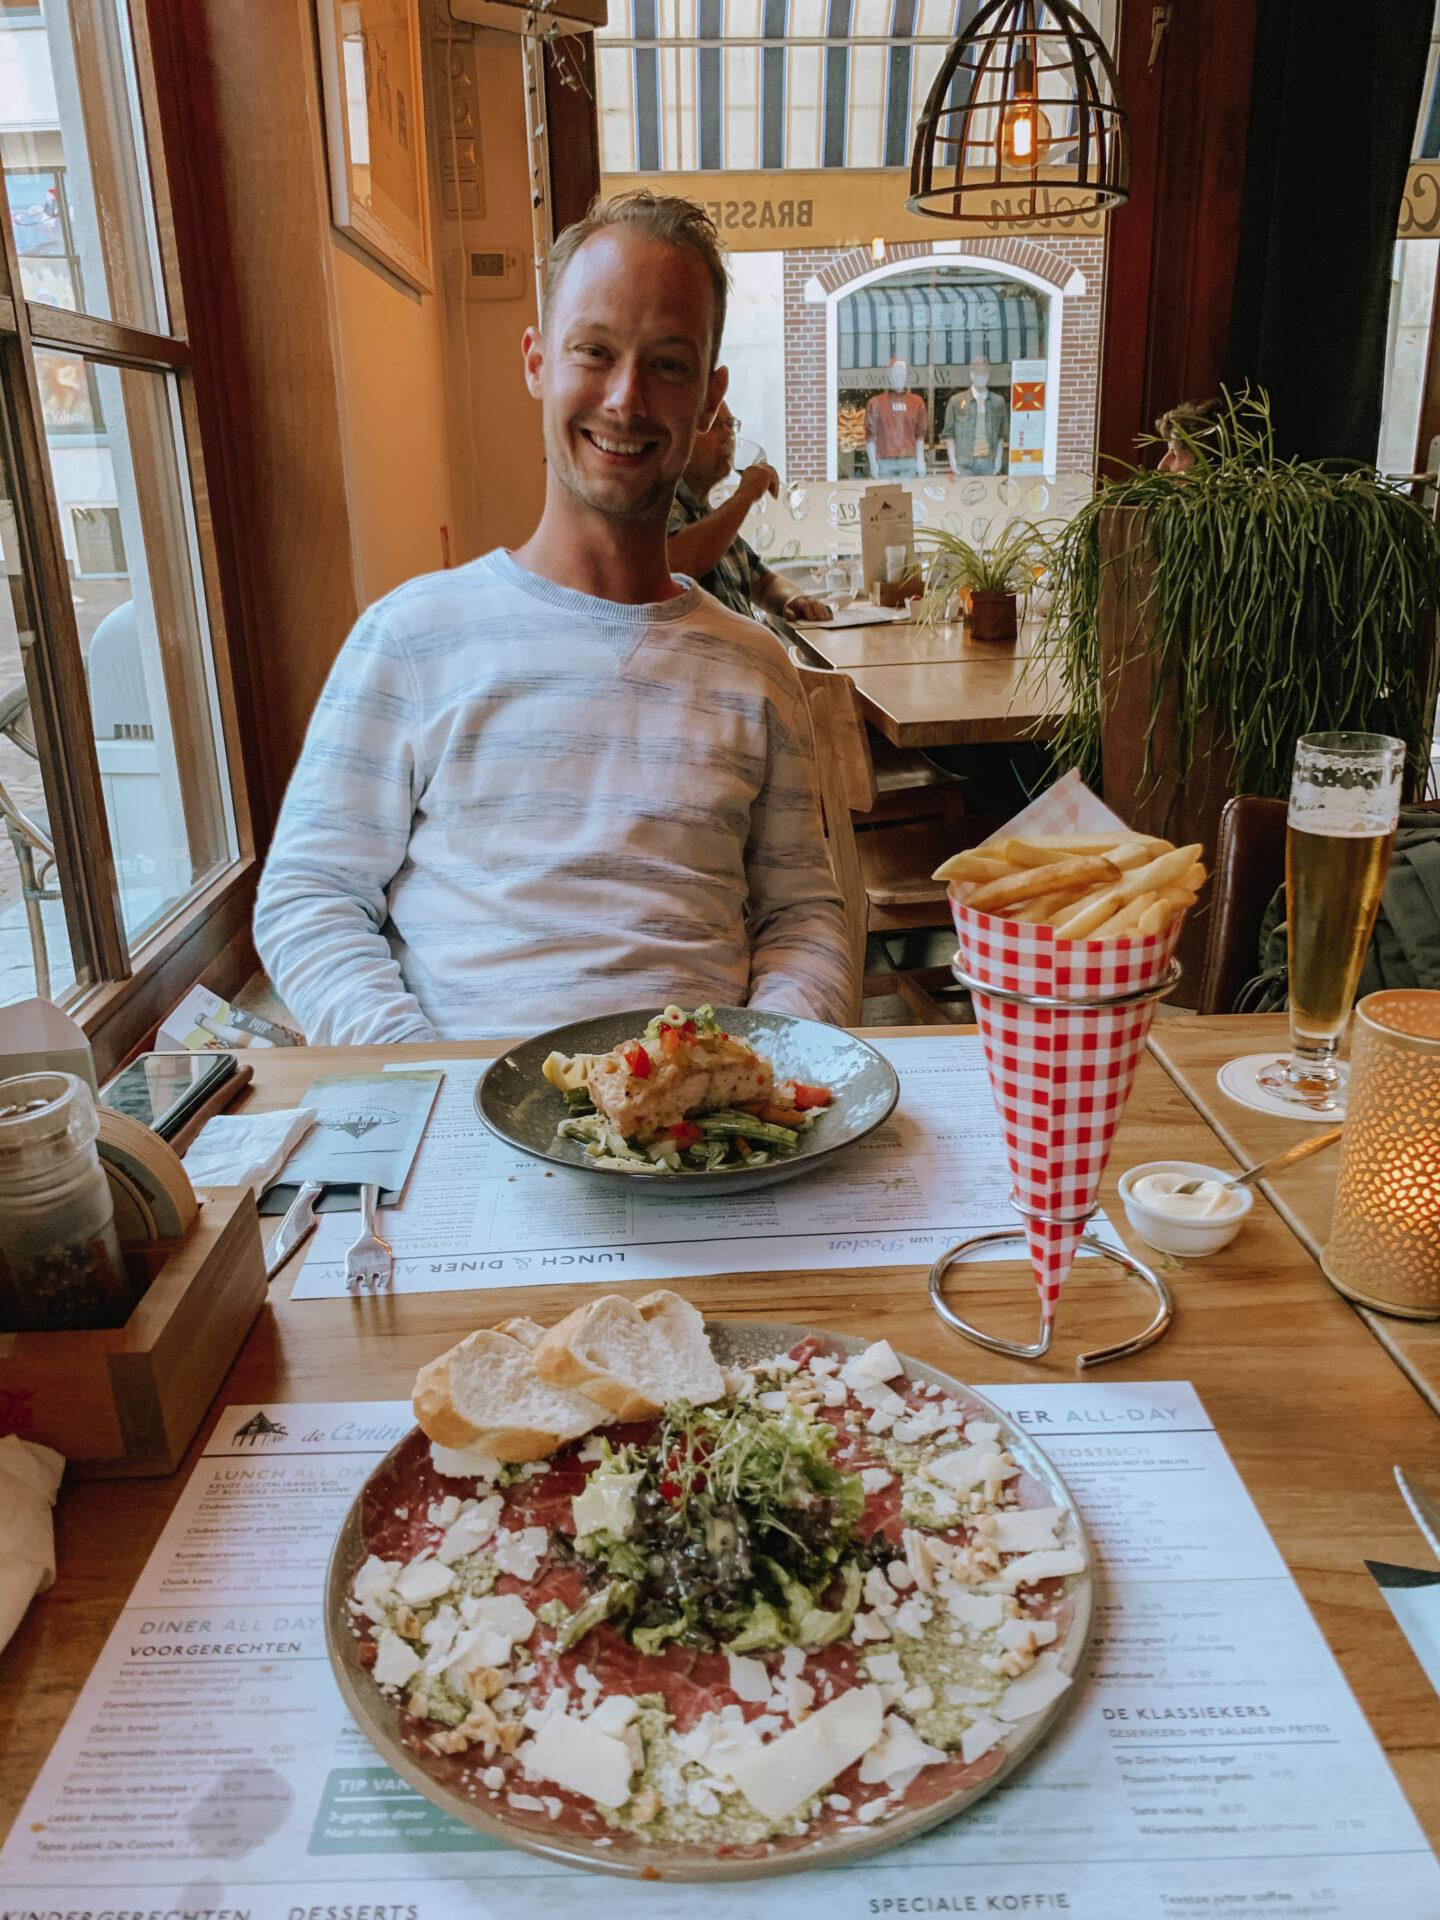 Texel culinair restaurant